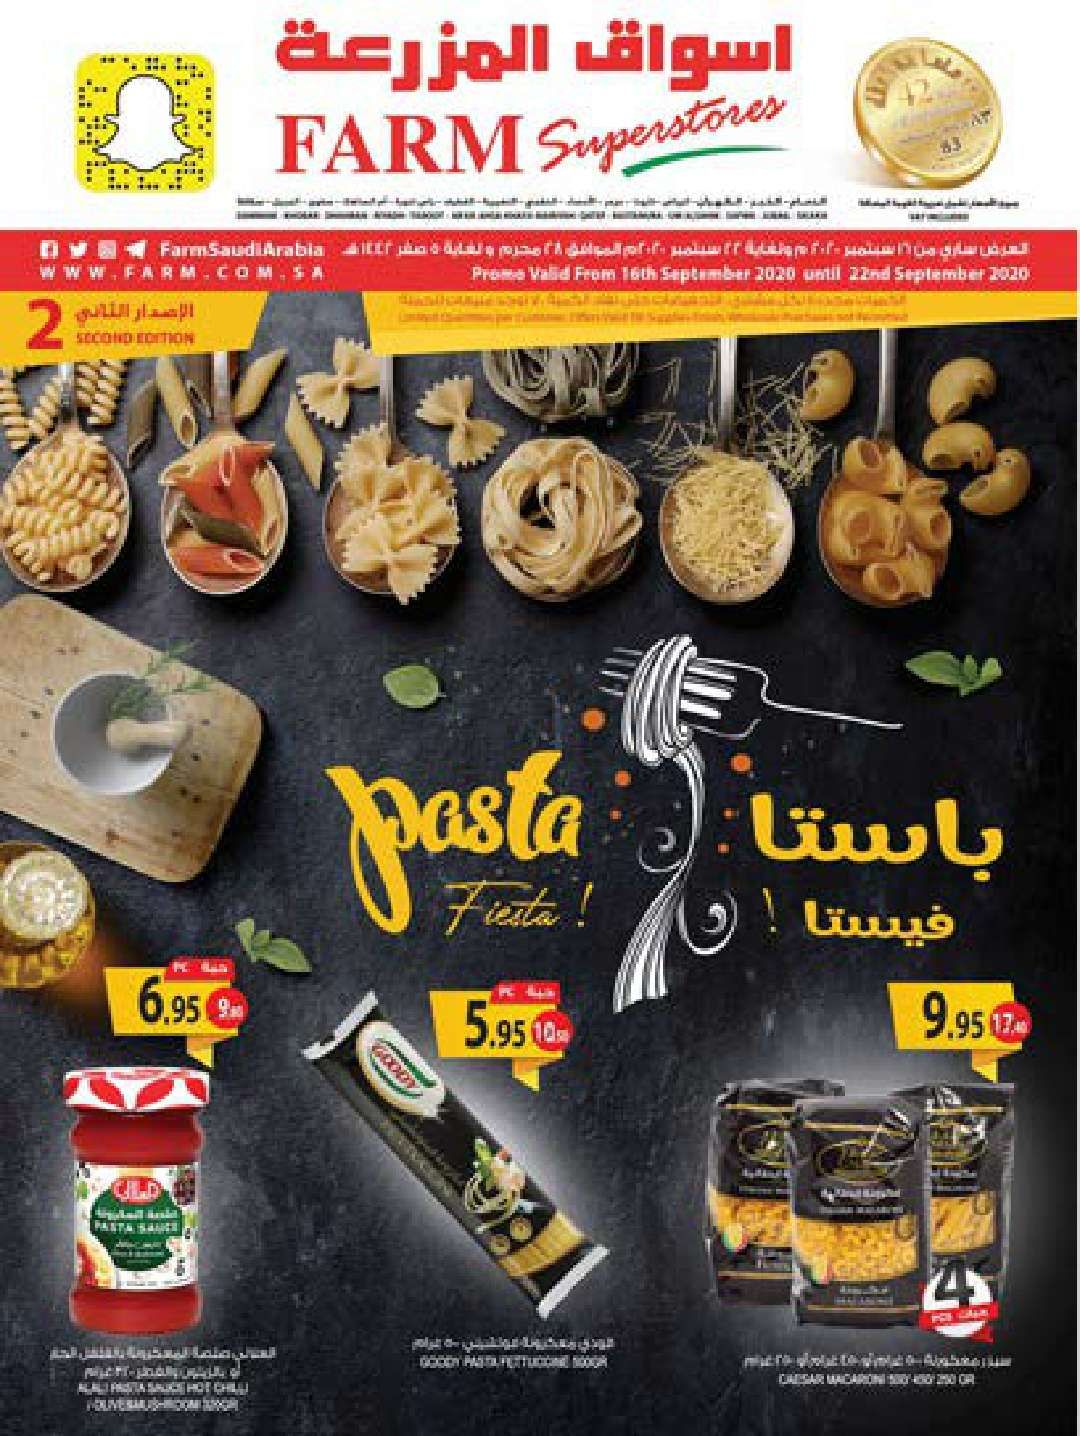 Pin By Soouq Sudia On عروض اسواق المزرعة In 2020 Farm Fiesta Food